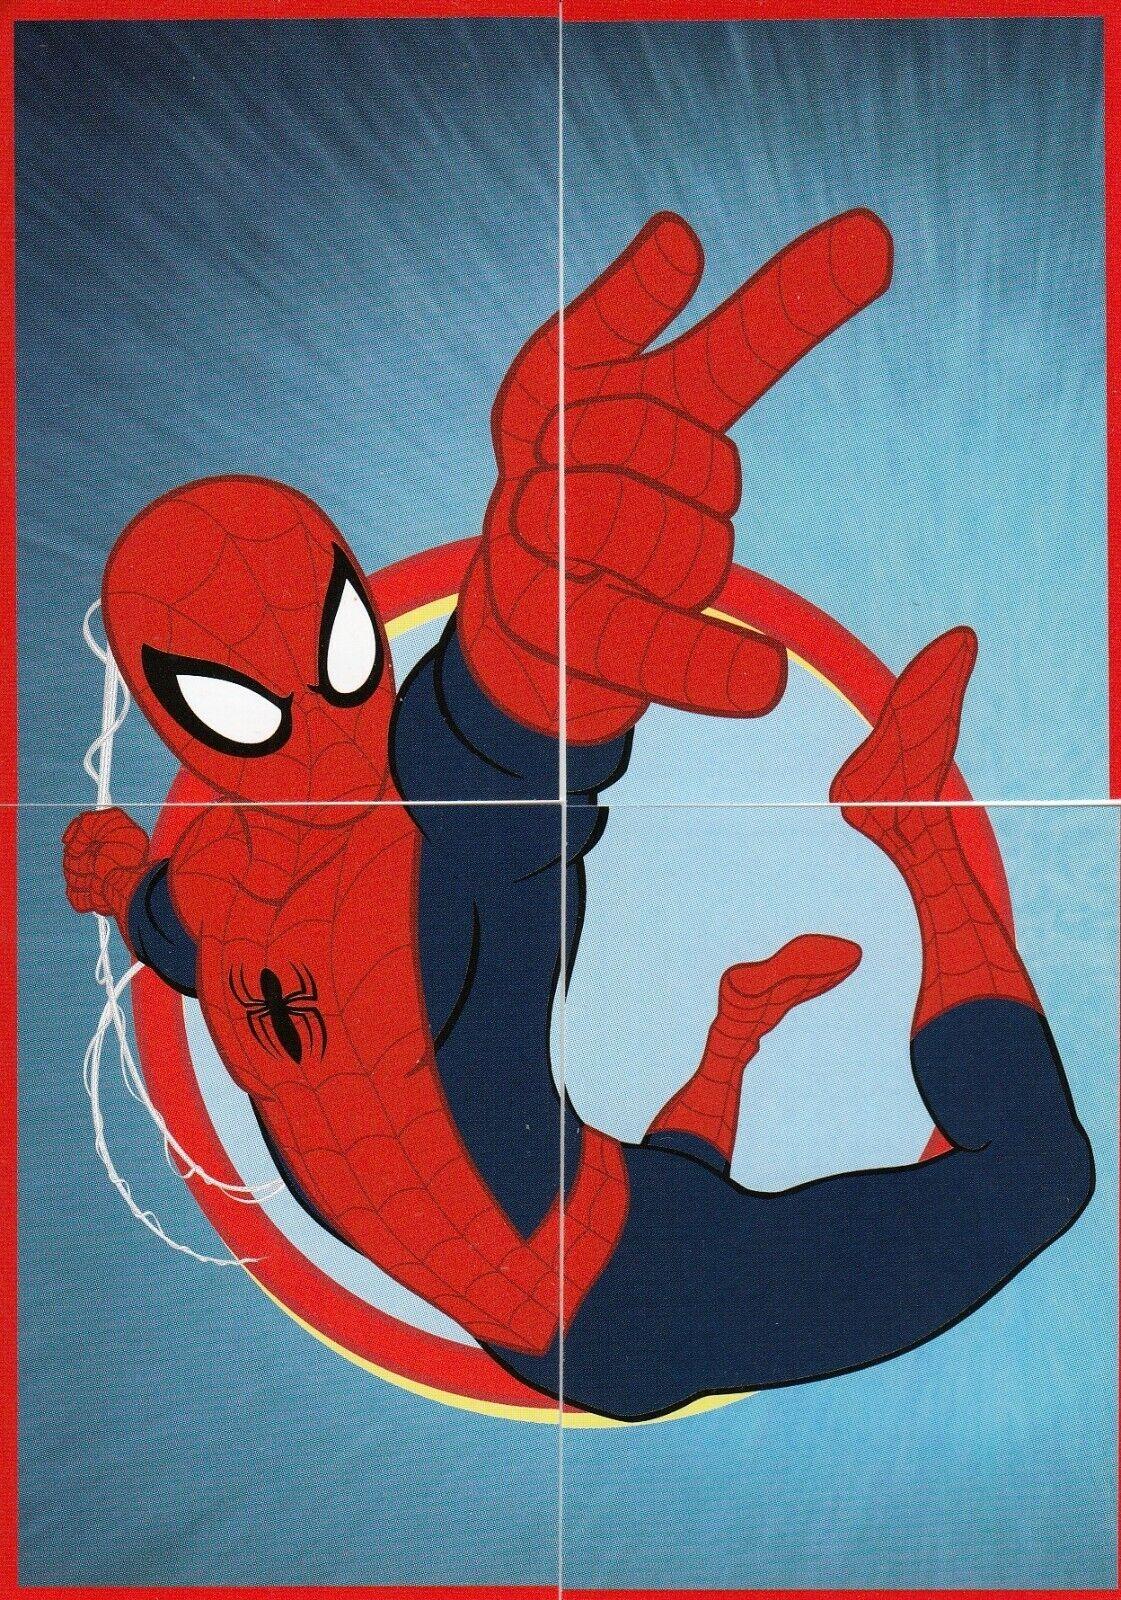 PANINI MARVEL ULTIMATE SPIDER-MAN  COMPLETE 192 STICKER SET /& ALBUM